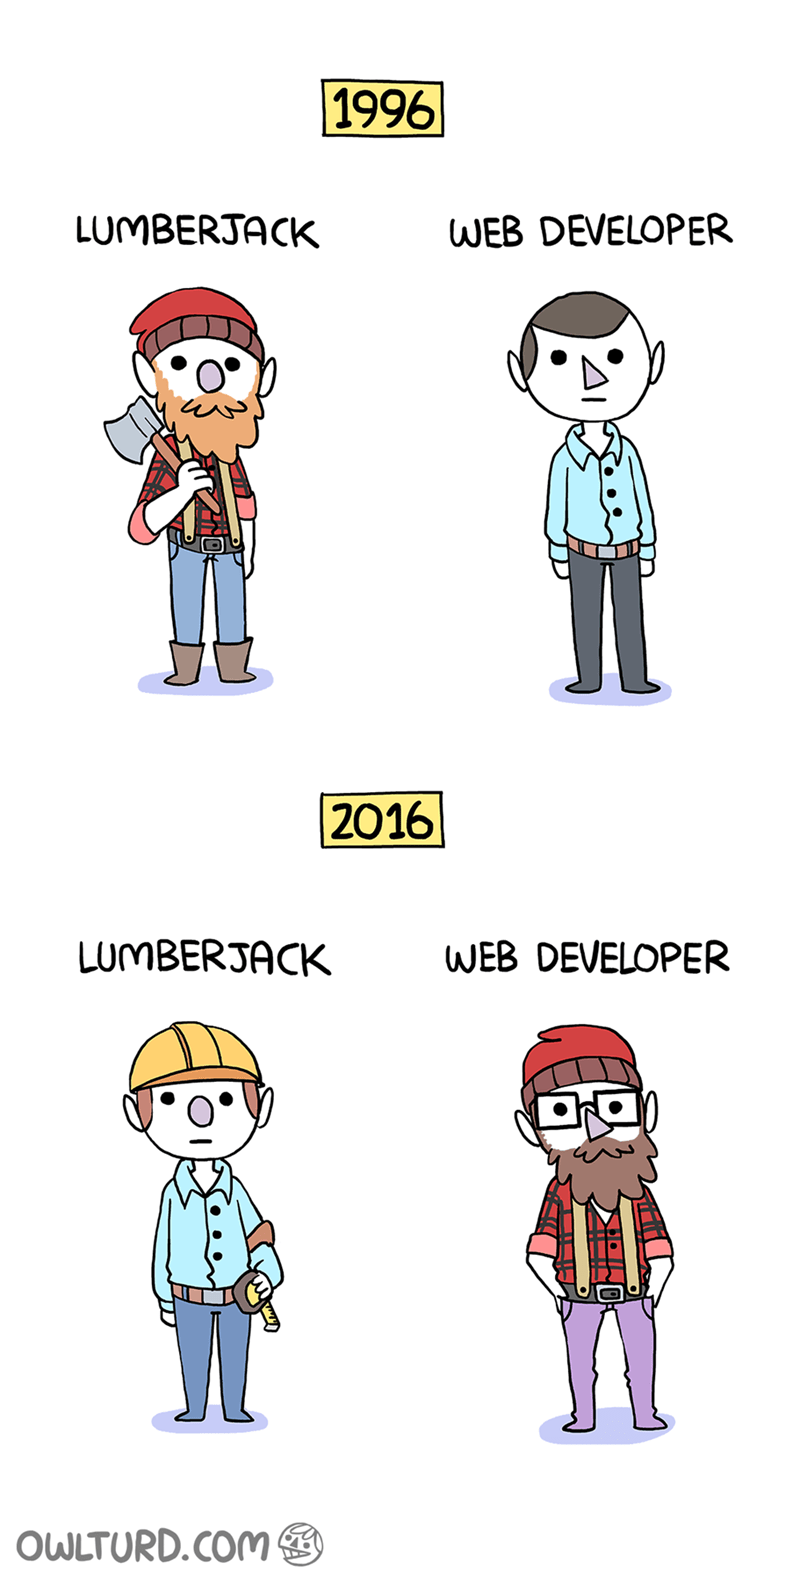 fashion wardrobe art drawing comics web developer button up short hair lumberjack beard beanie and checkered shirt swap 1996 2016